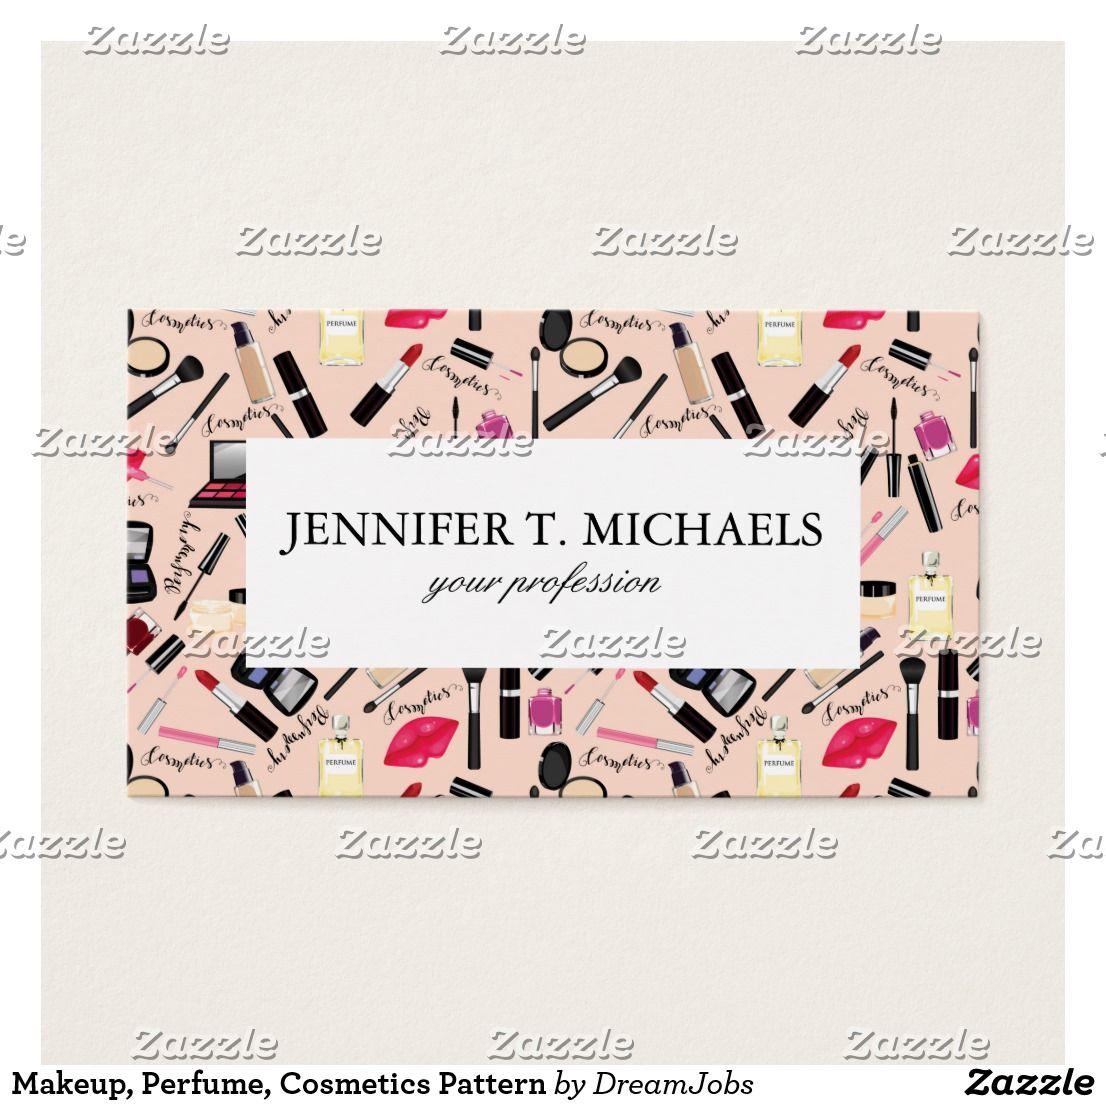 Makeup, Perfume, Cosmetics Pattern Business Card   Dream job